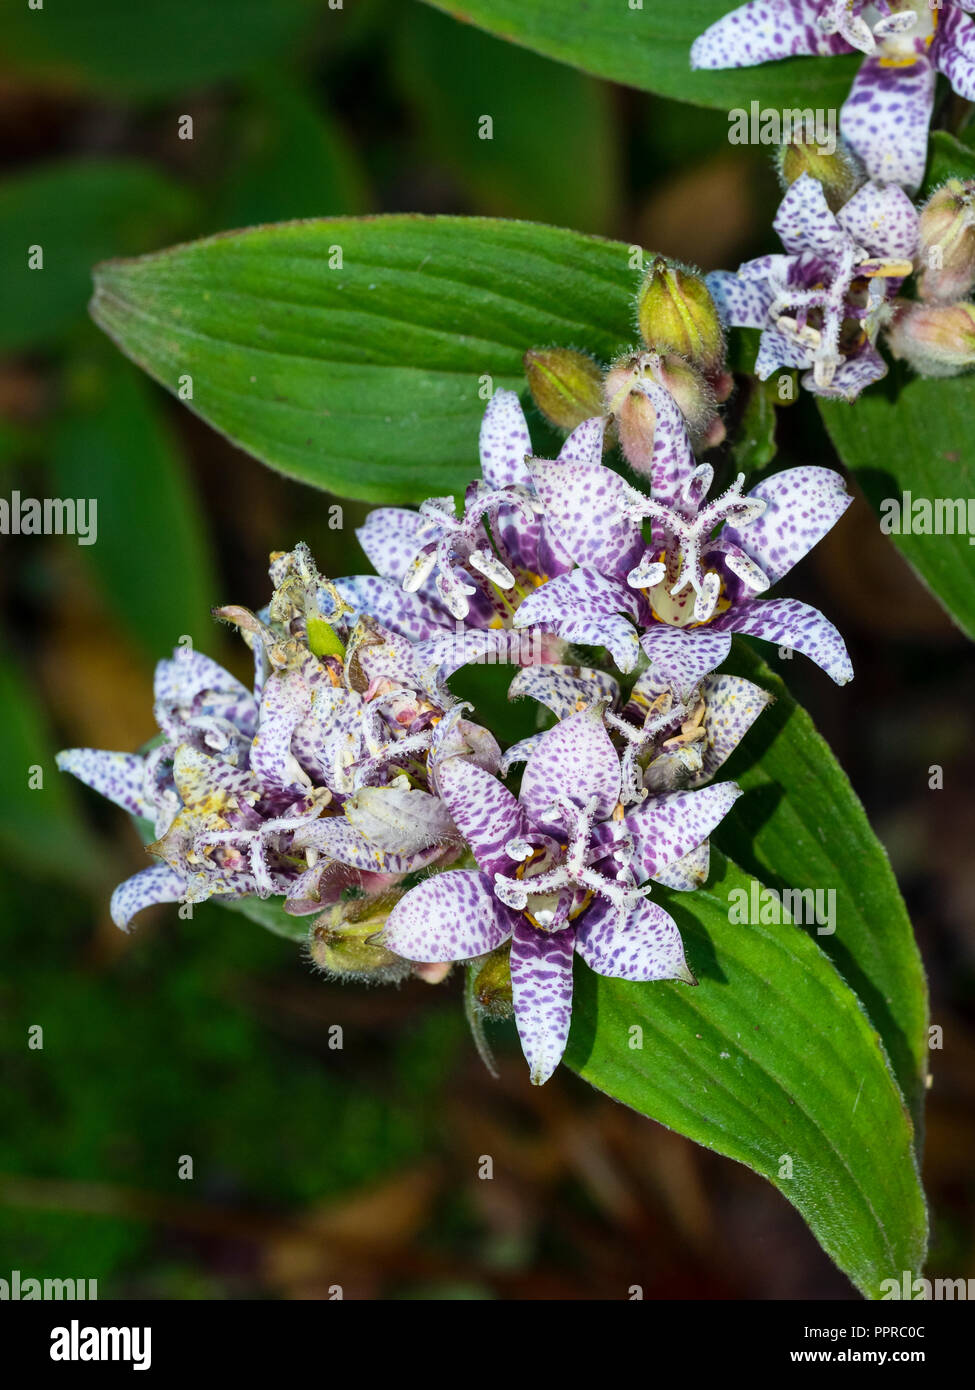 Racimos de flores de color blanco moteado púrpura de la perenne hardy sapo japonés lily, Tricyrtis hirta Foto de stock